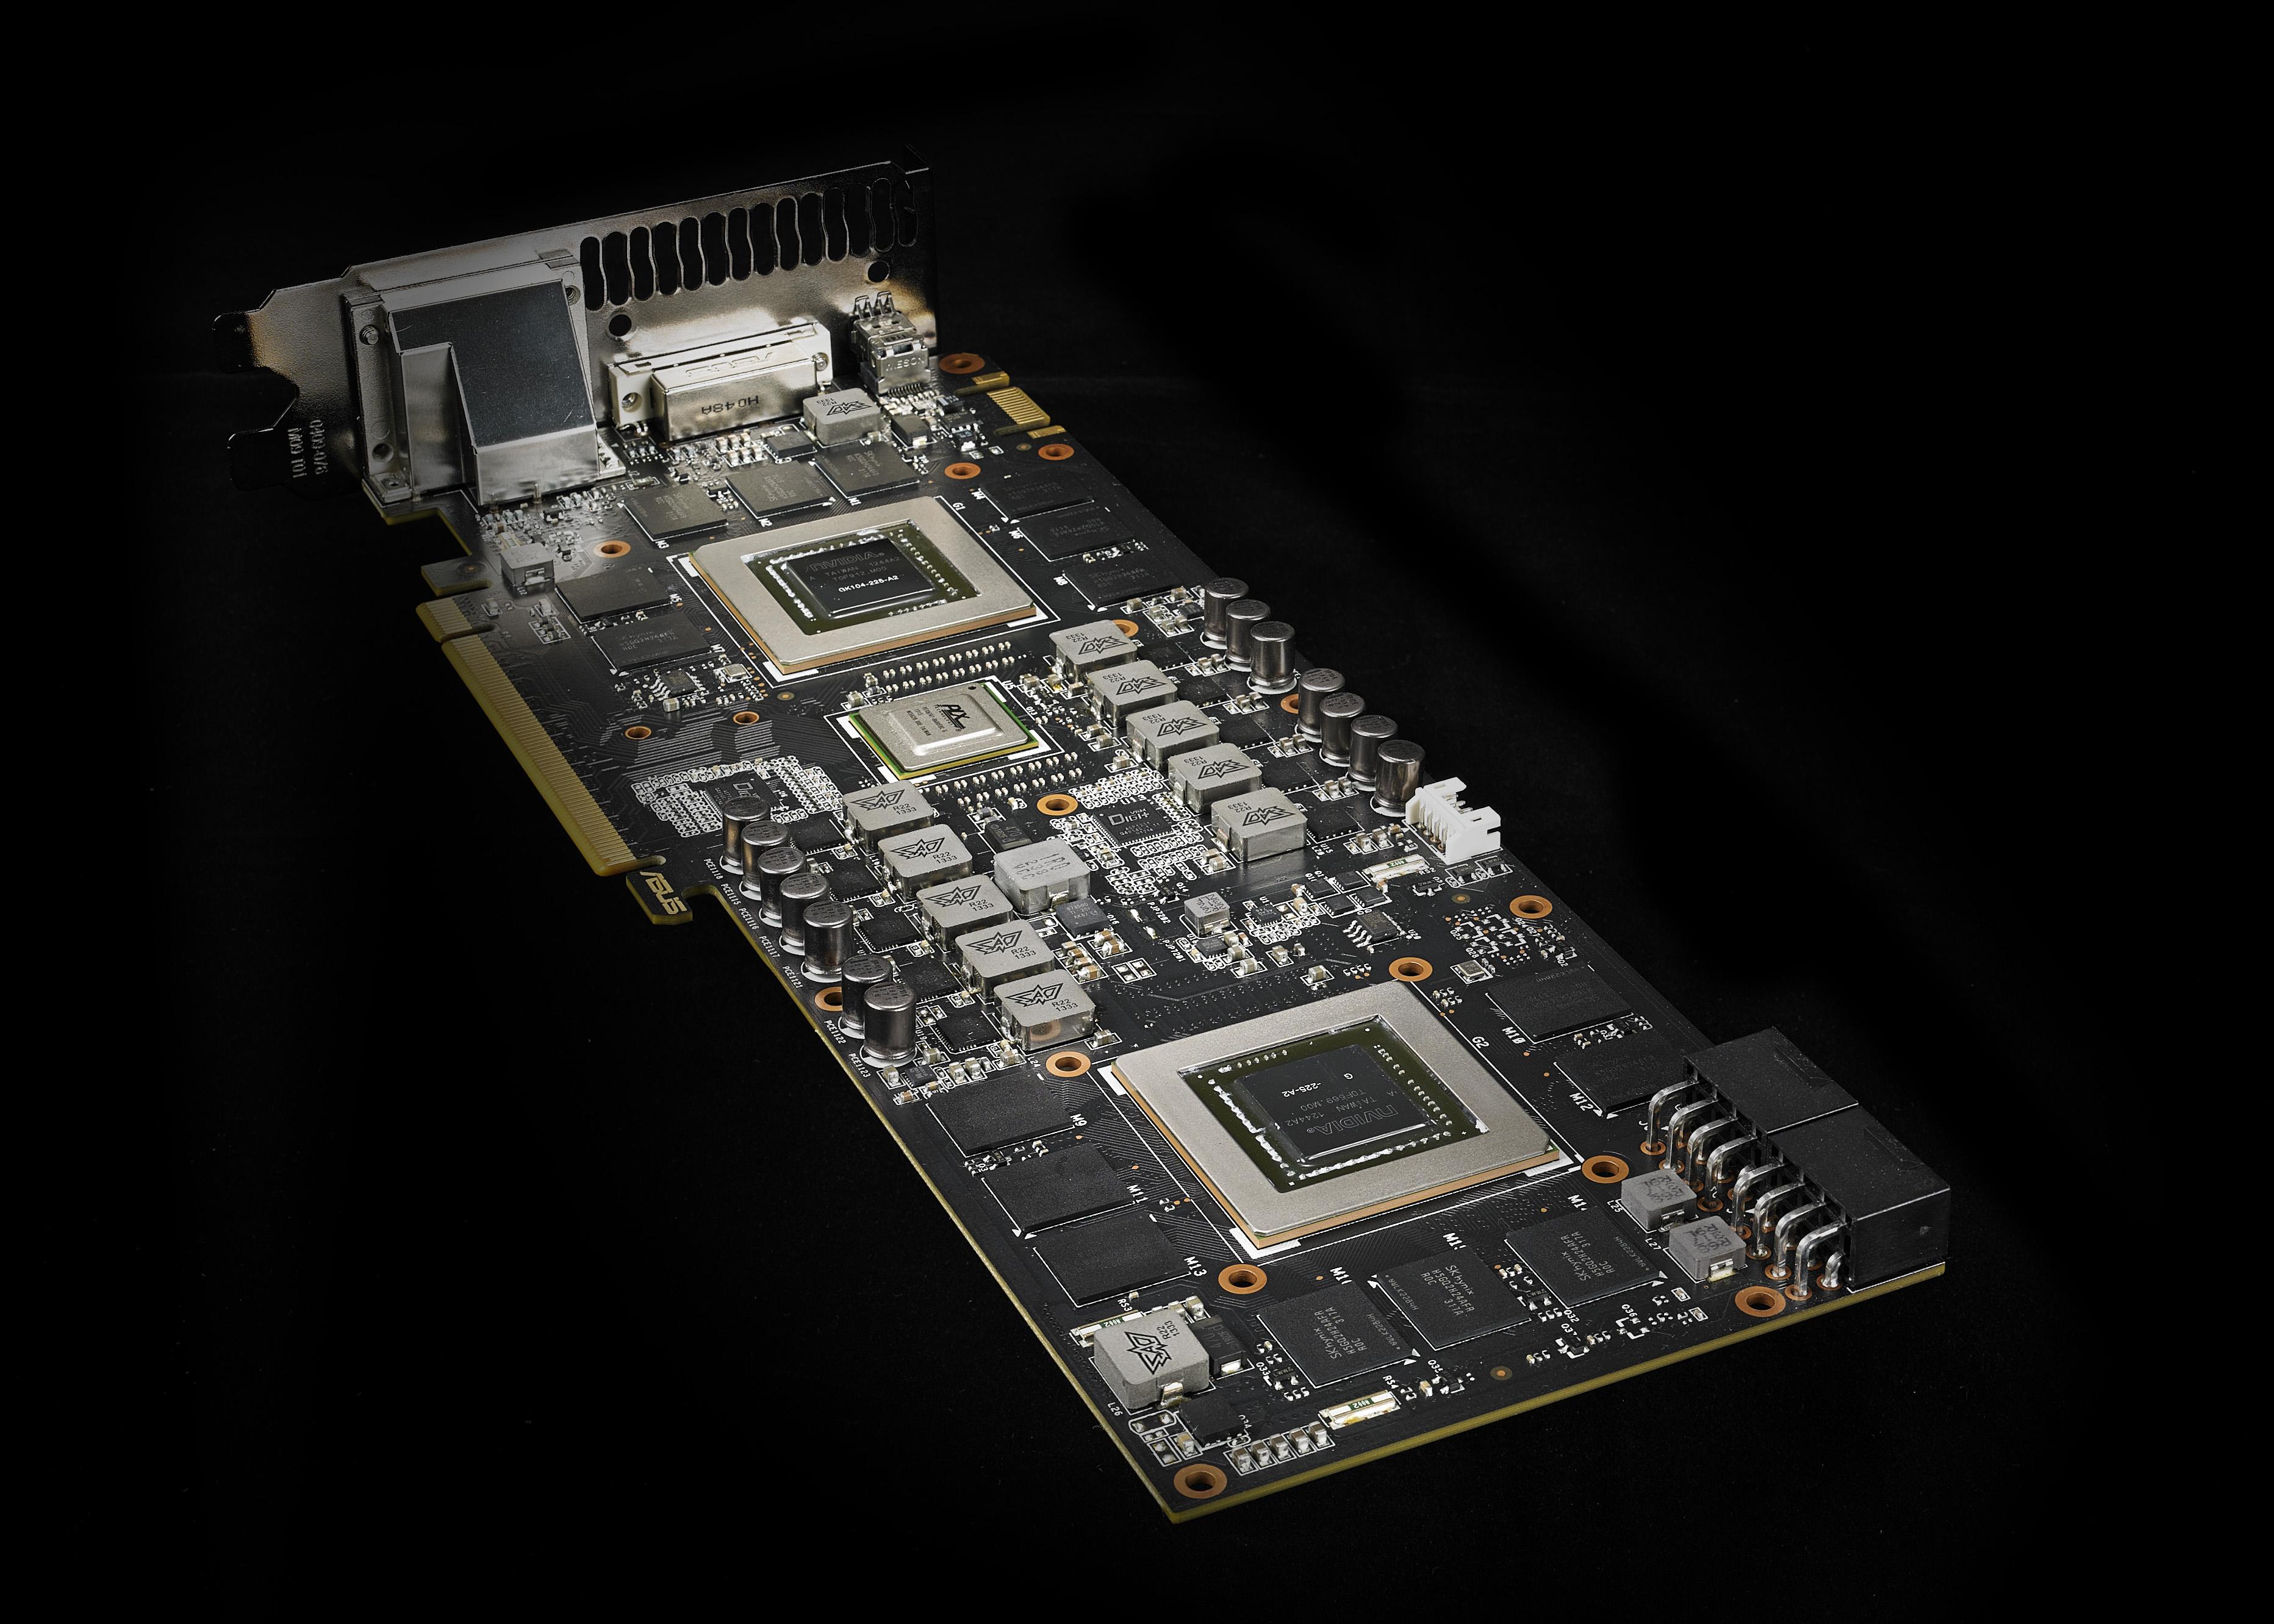 ASUS Republic of Gamers Announces Mars 760 Graphics Card